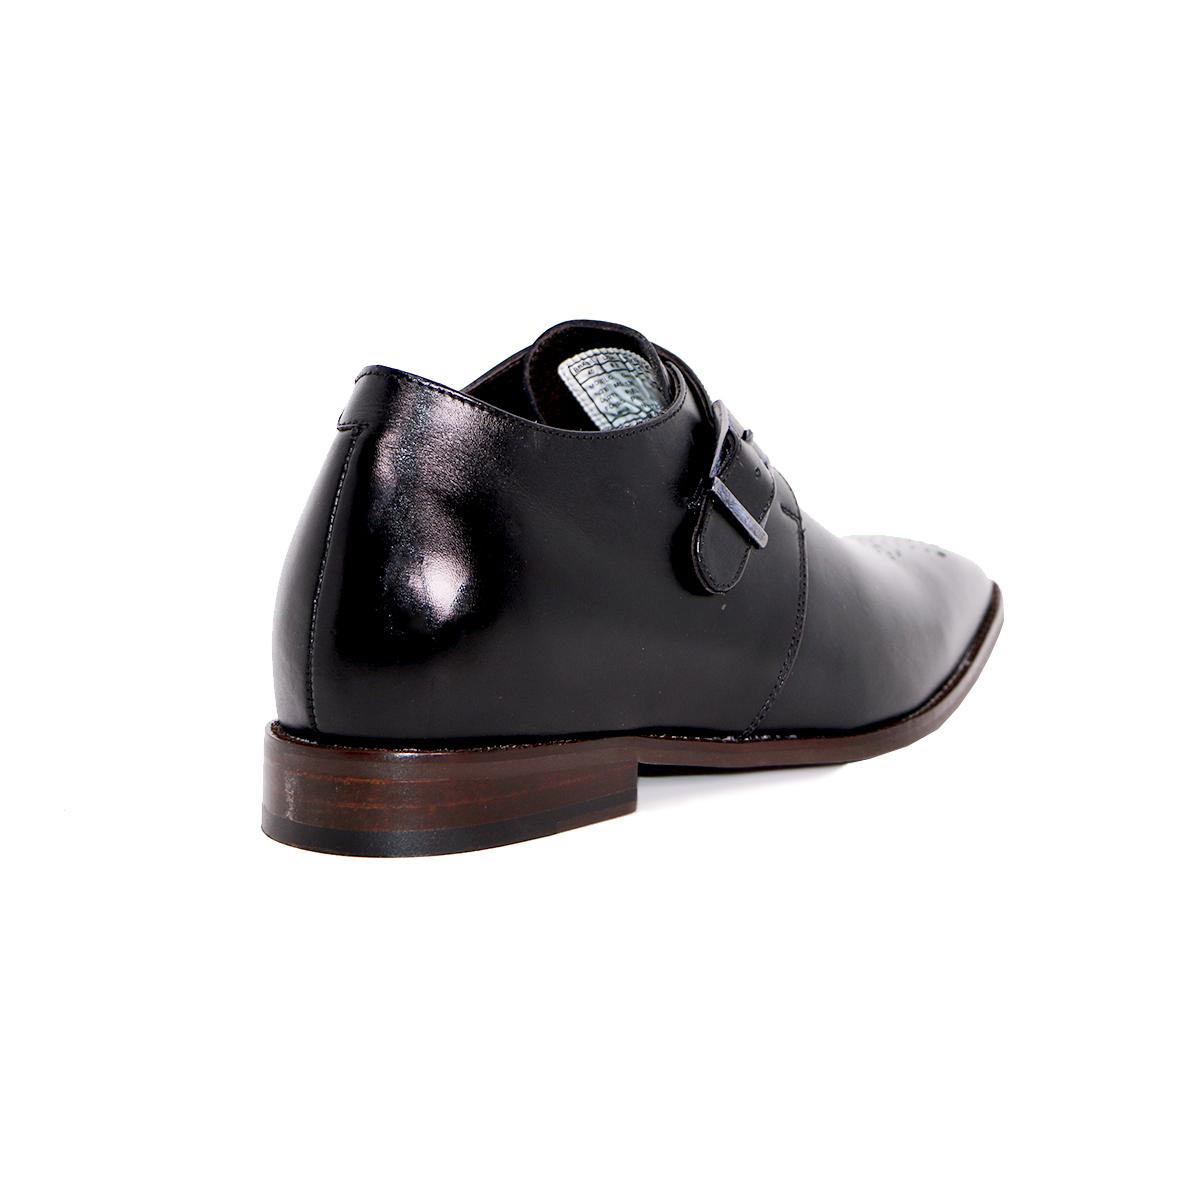 Zapato Formal Gentleman Negro Max Denegri +7cms De Altura_72725